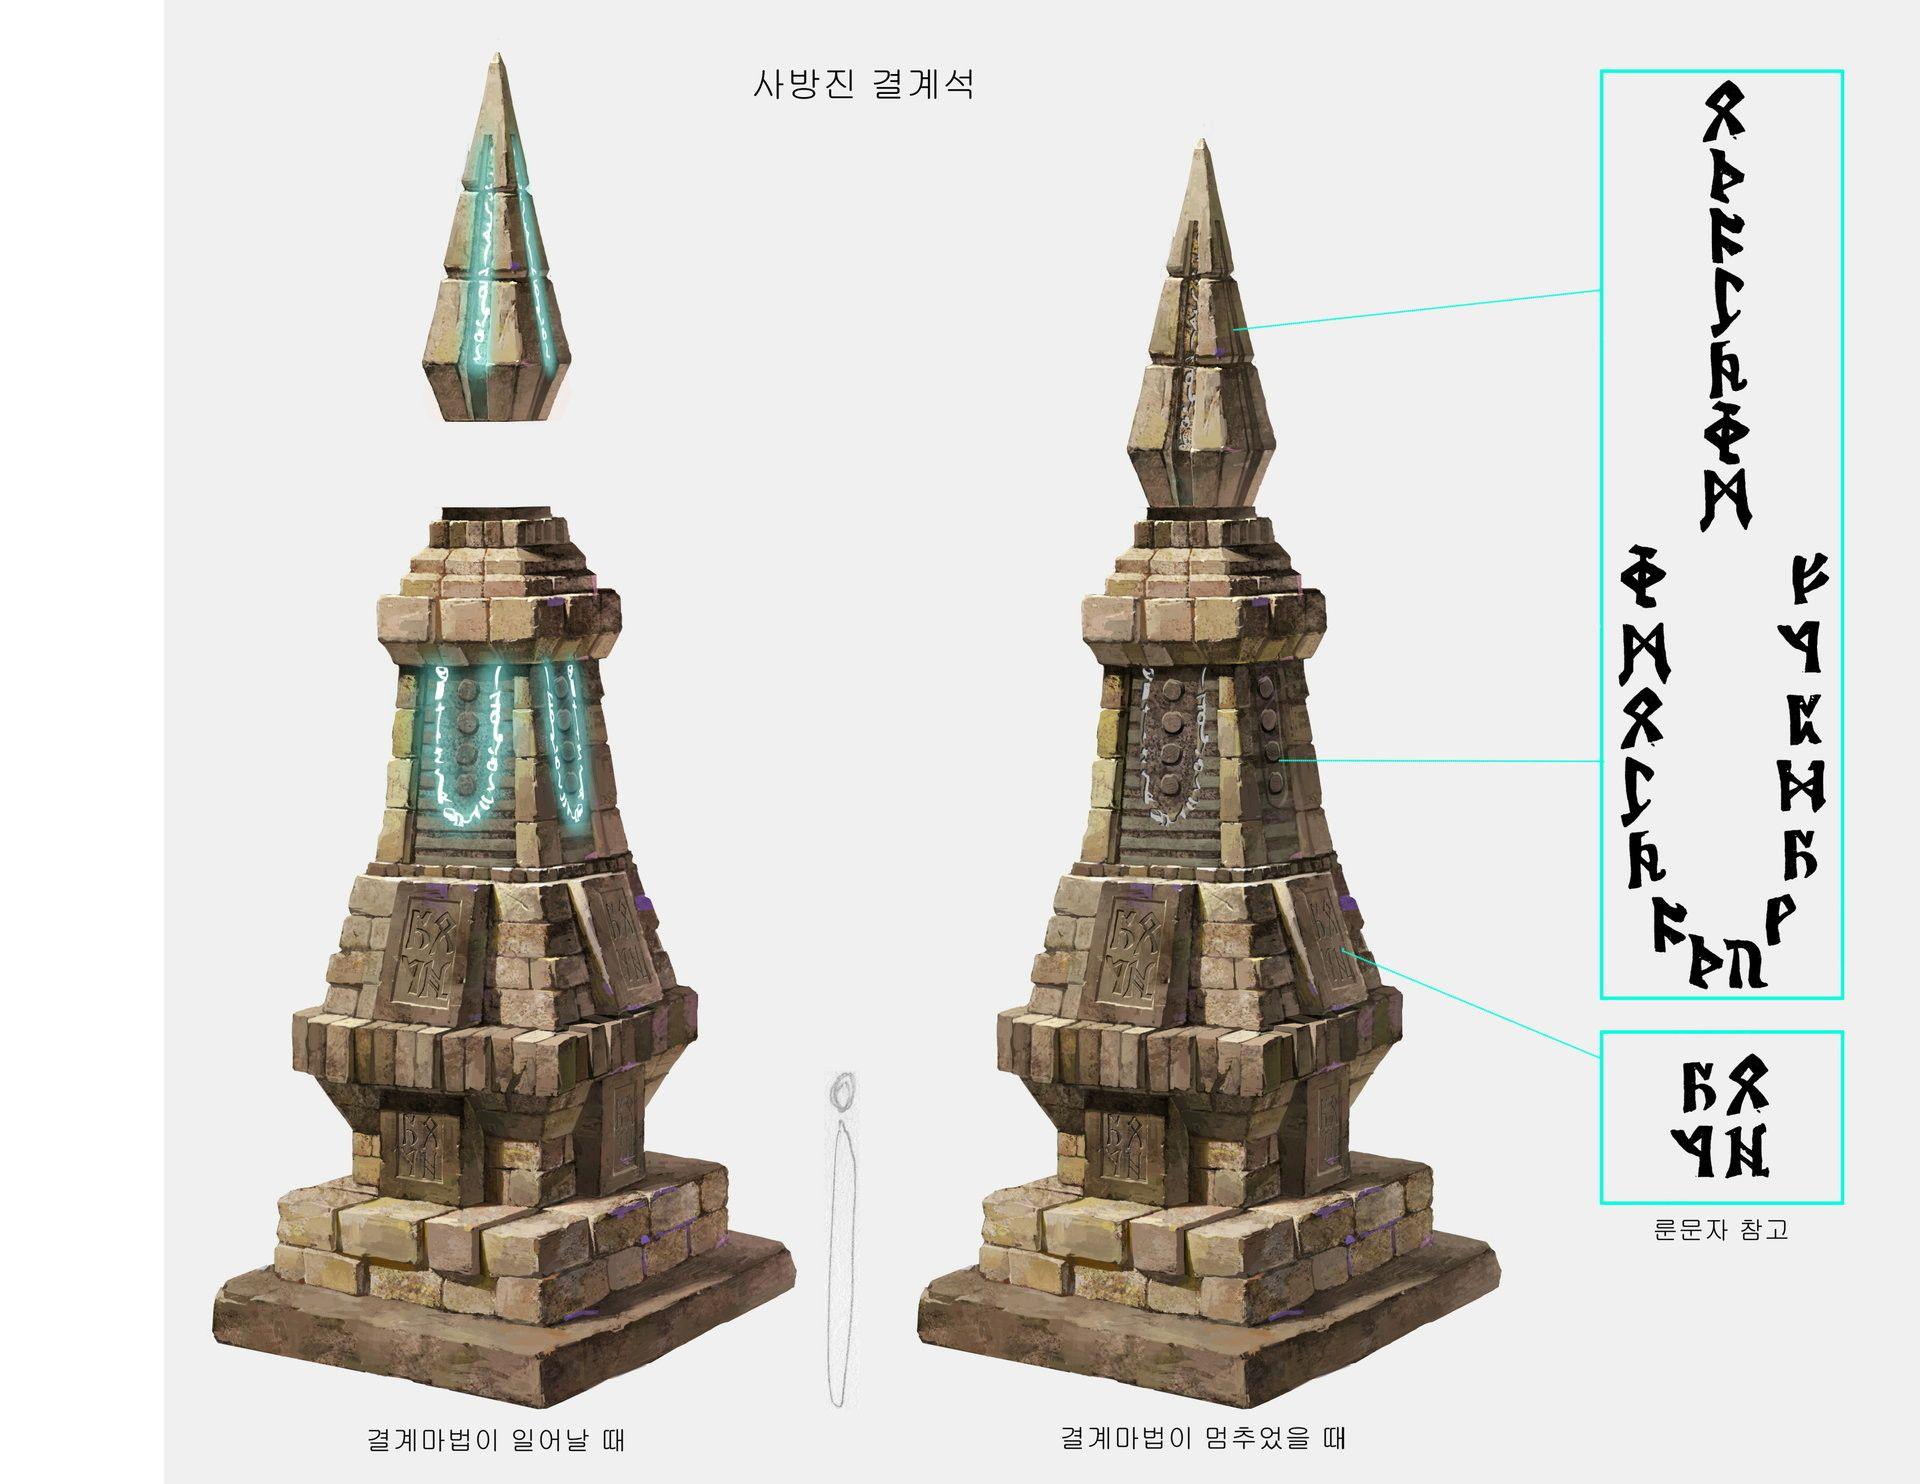 ArtStation - Tower Ruins~ Concept by KKS, Ron Kam